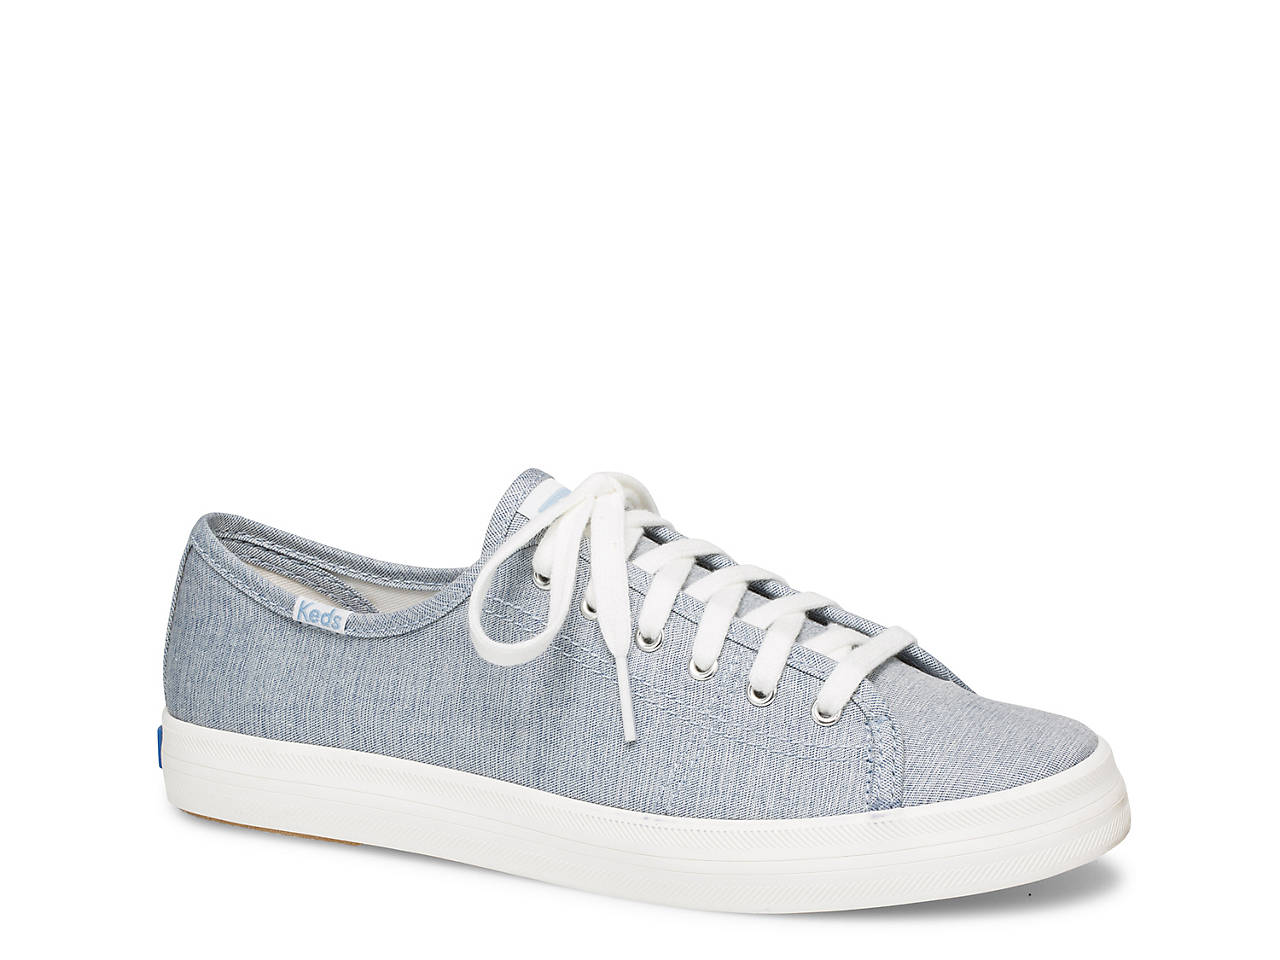 Keds Kickstart Mini Chambray Sneaker - Women s Women s Shoes  fe0682dce